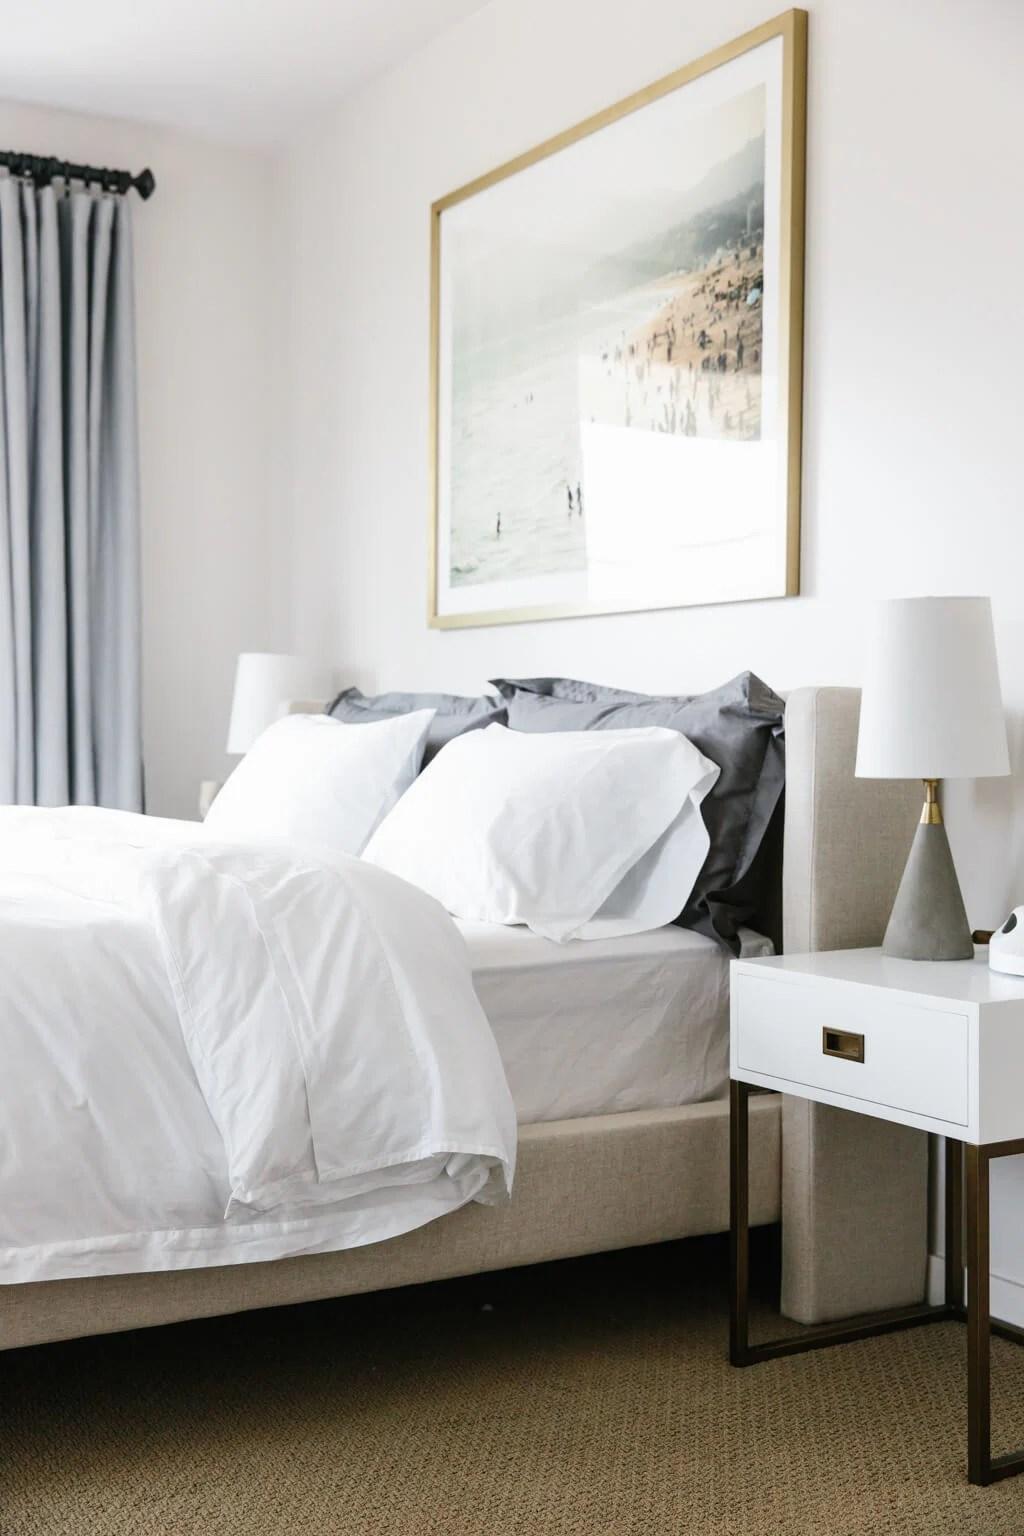 My Modern and Minimalist Bedroom Design with Havenly ... on Minimalist Bedroom Ideas  id=64025